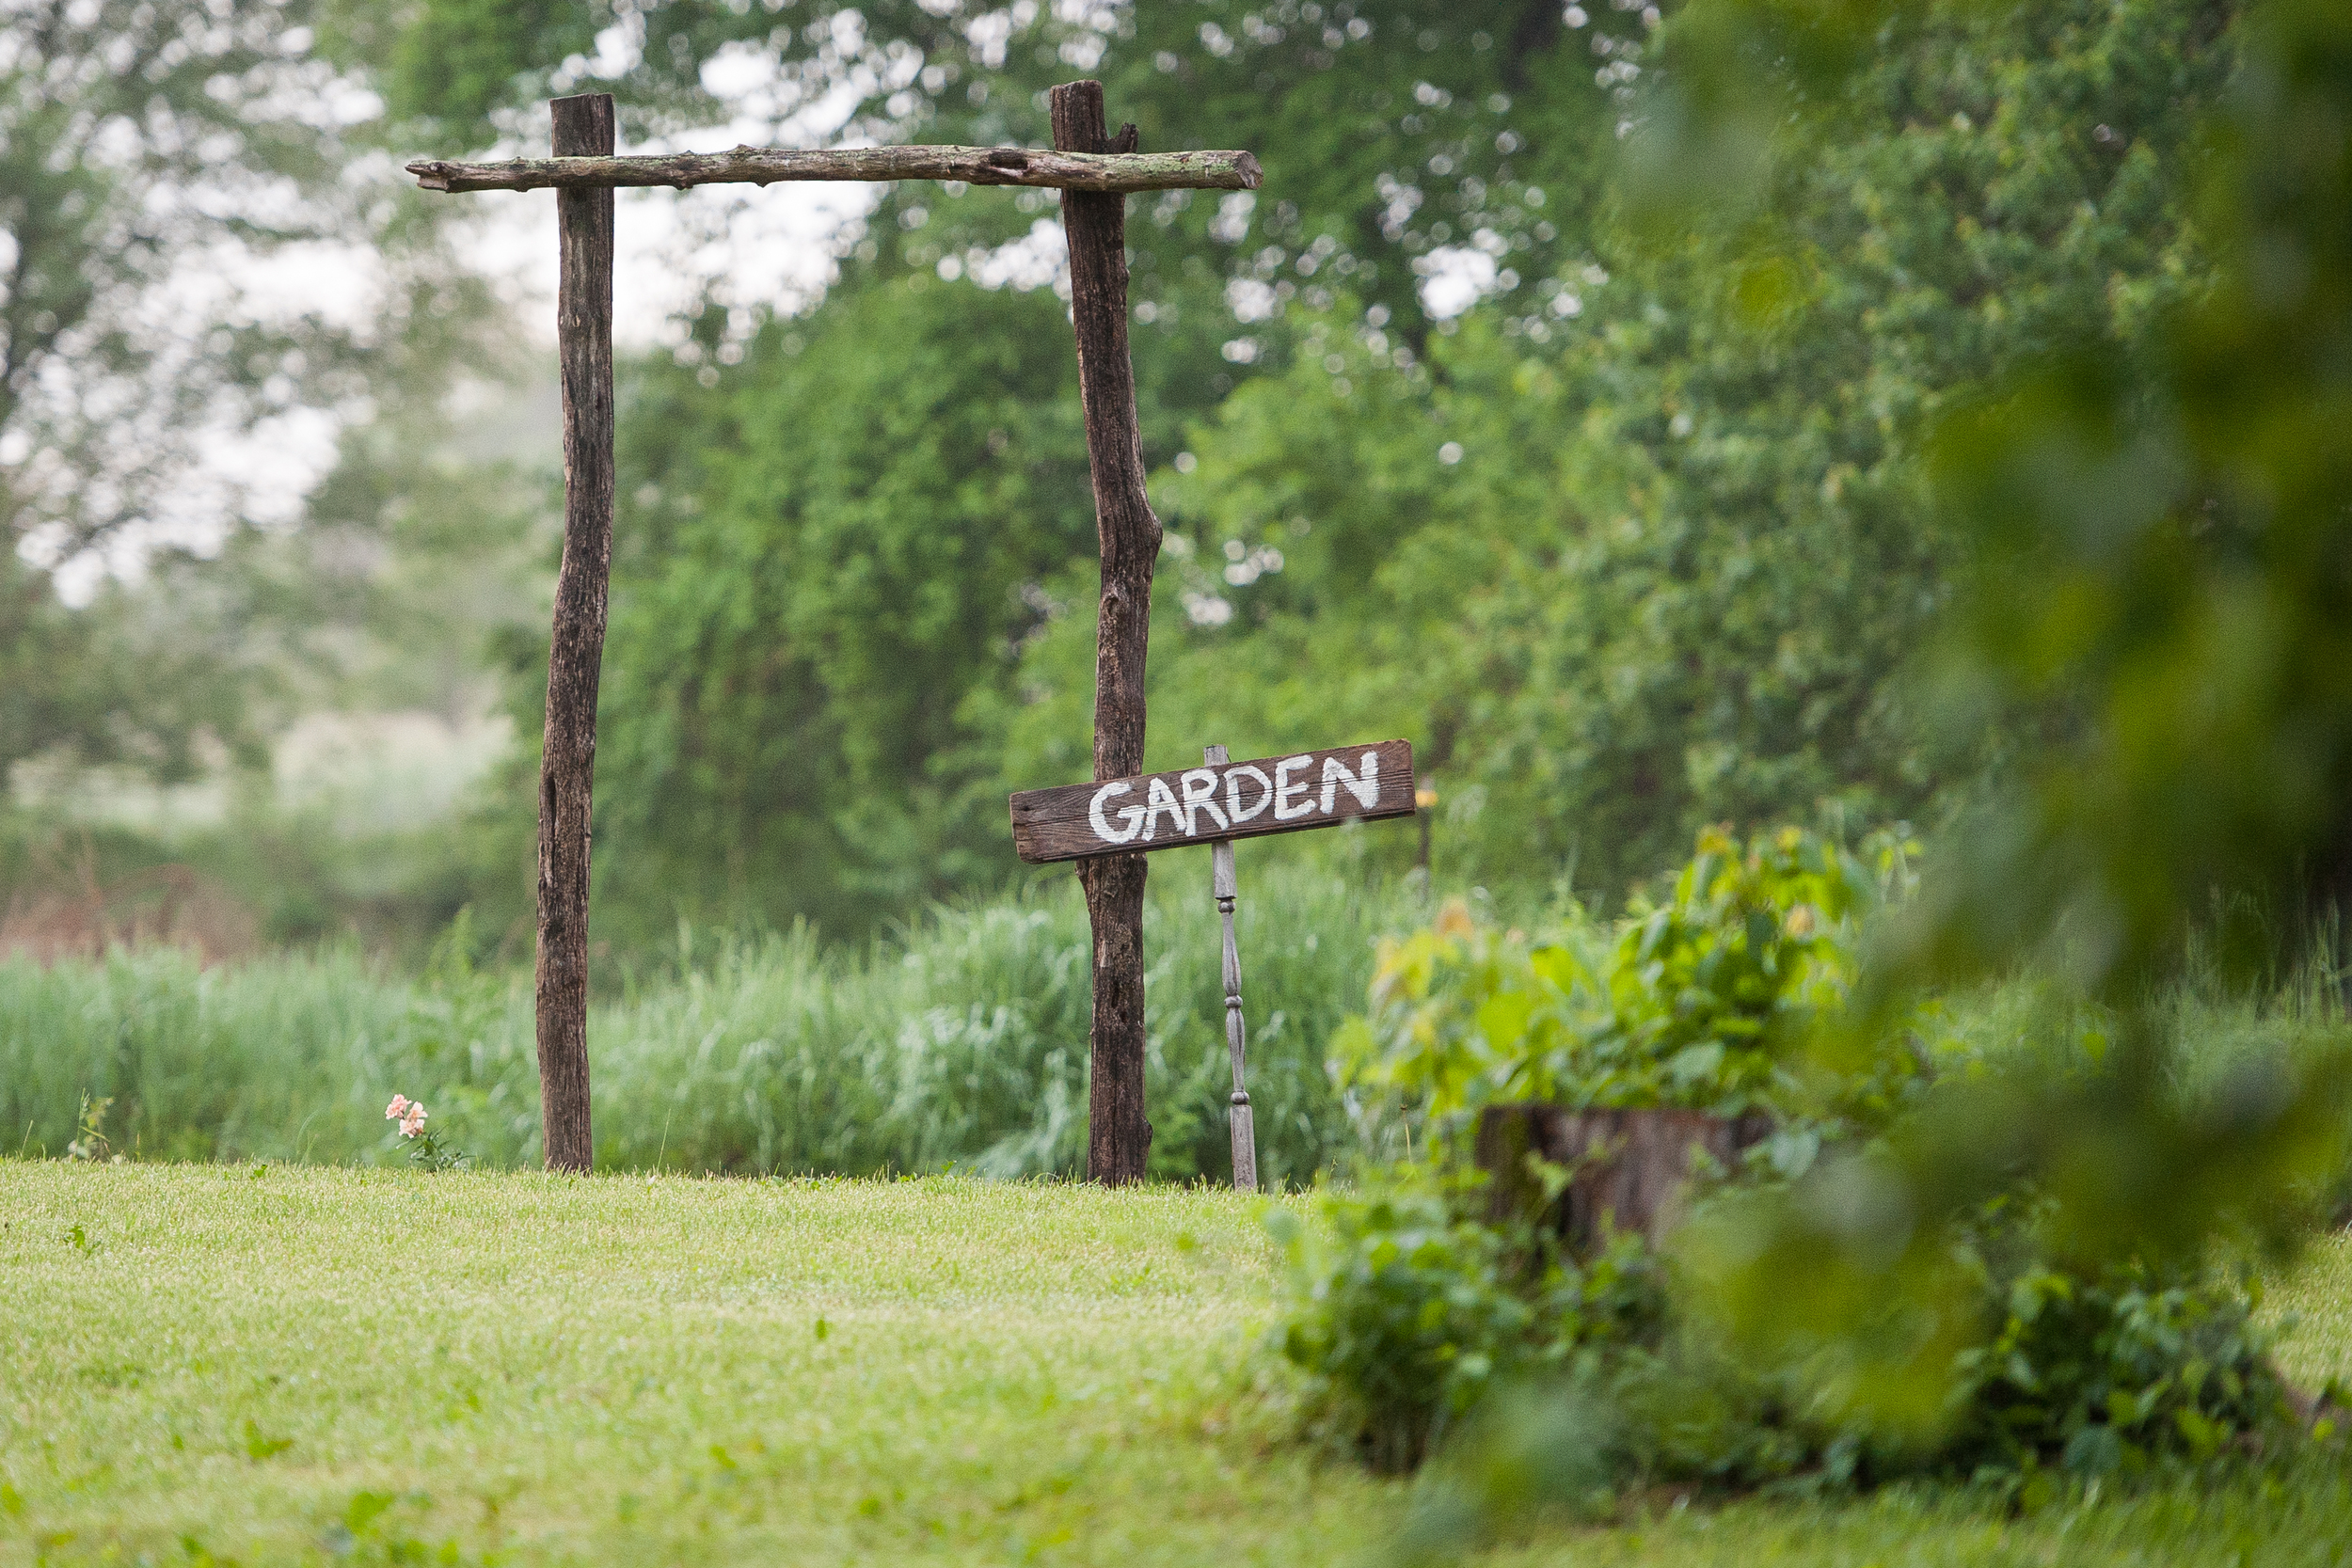 the Buckwalter garden 2015 edition